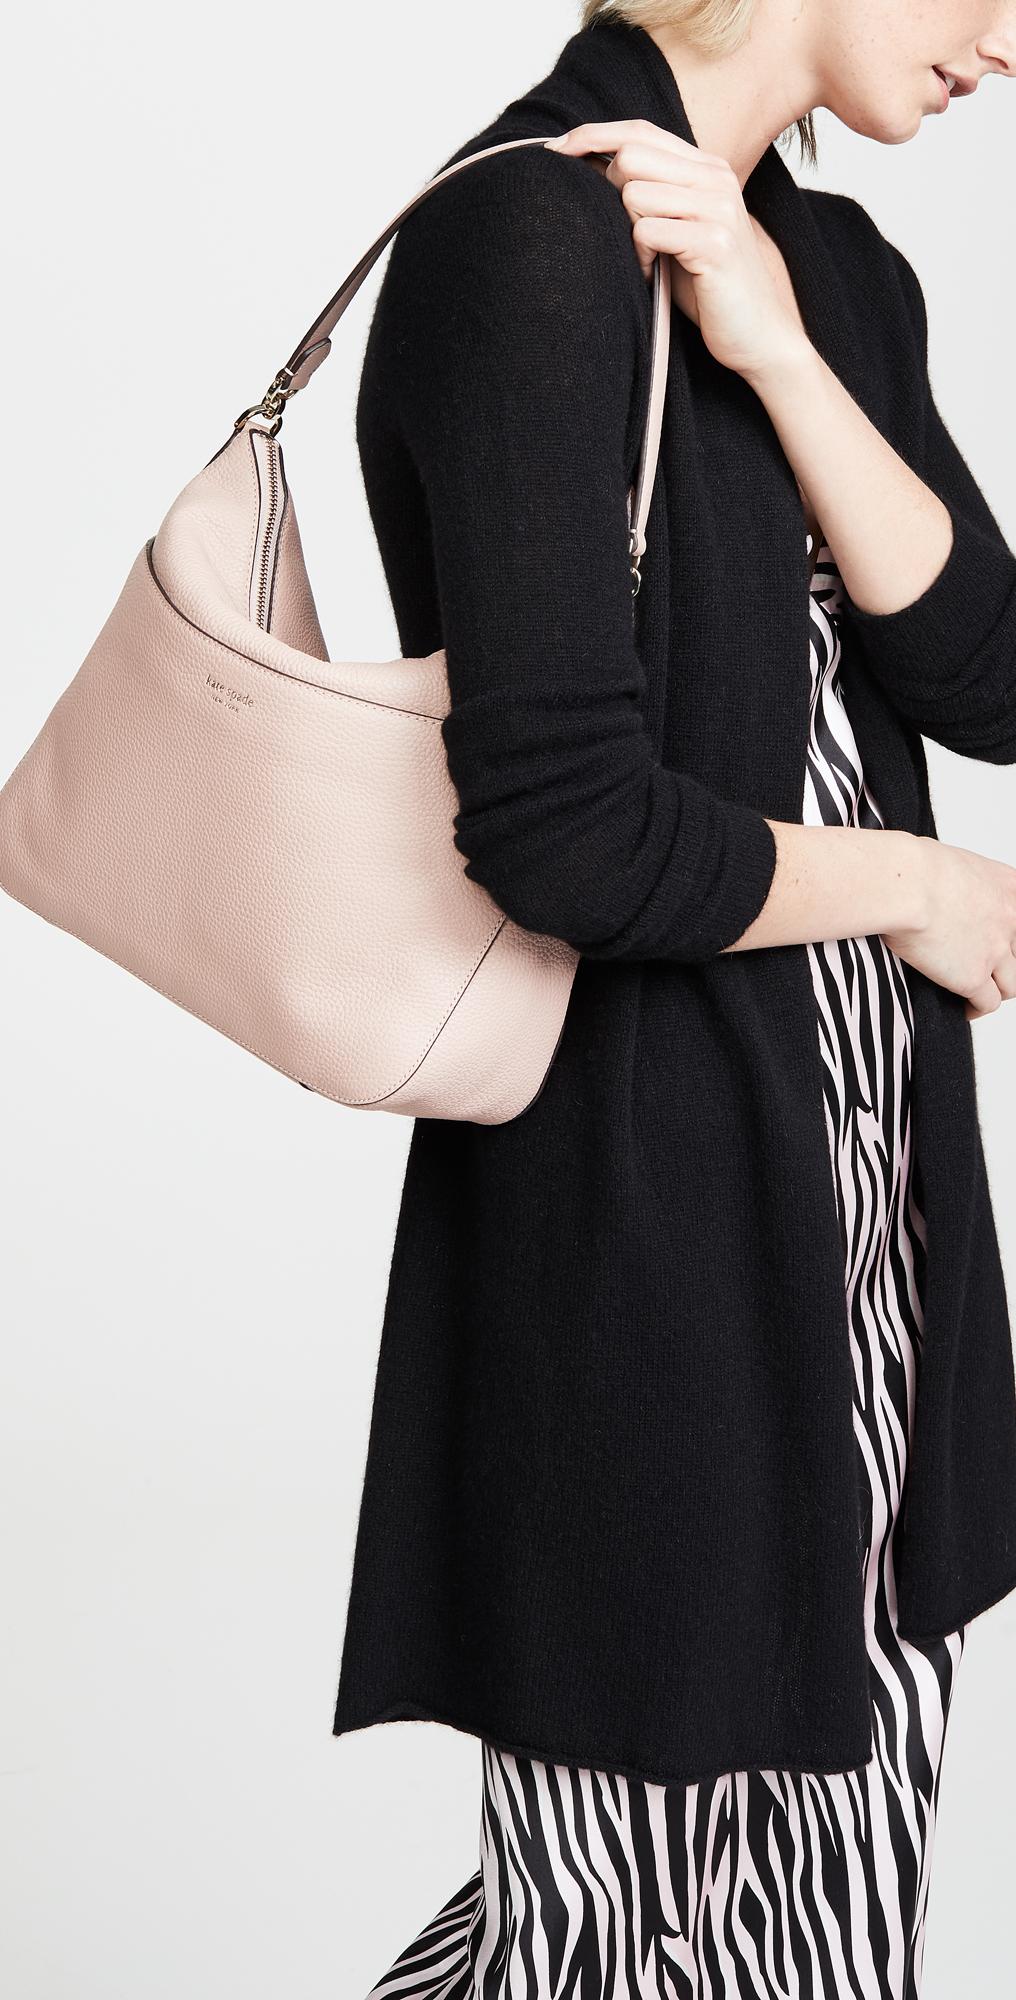 Kate Spade New York Polly Medium Shoulder Bag Shopbop